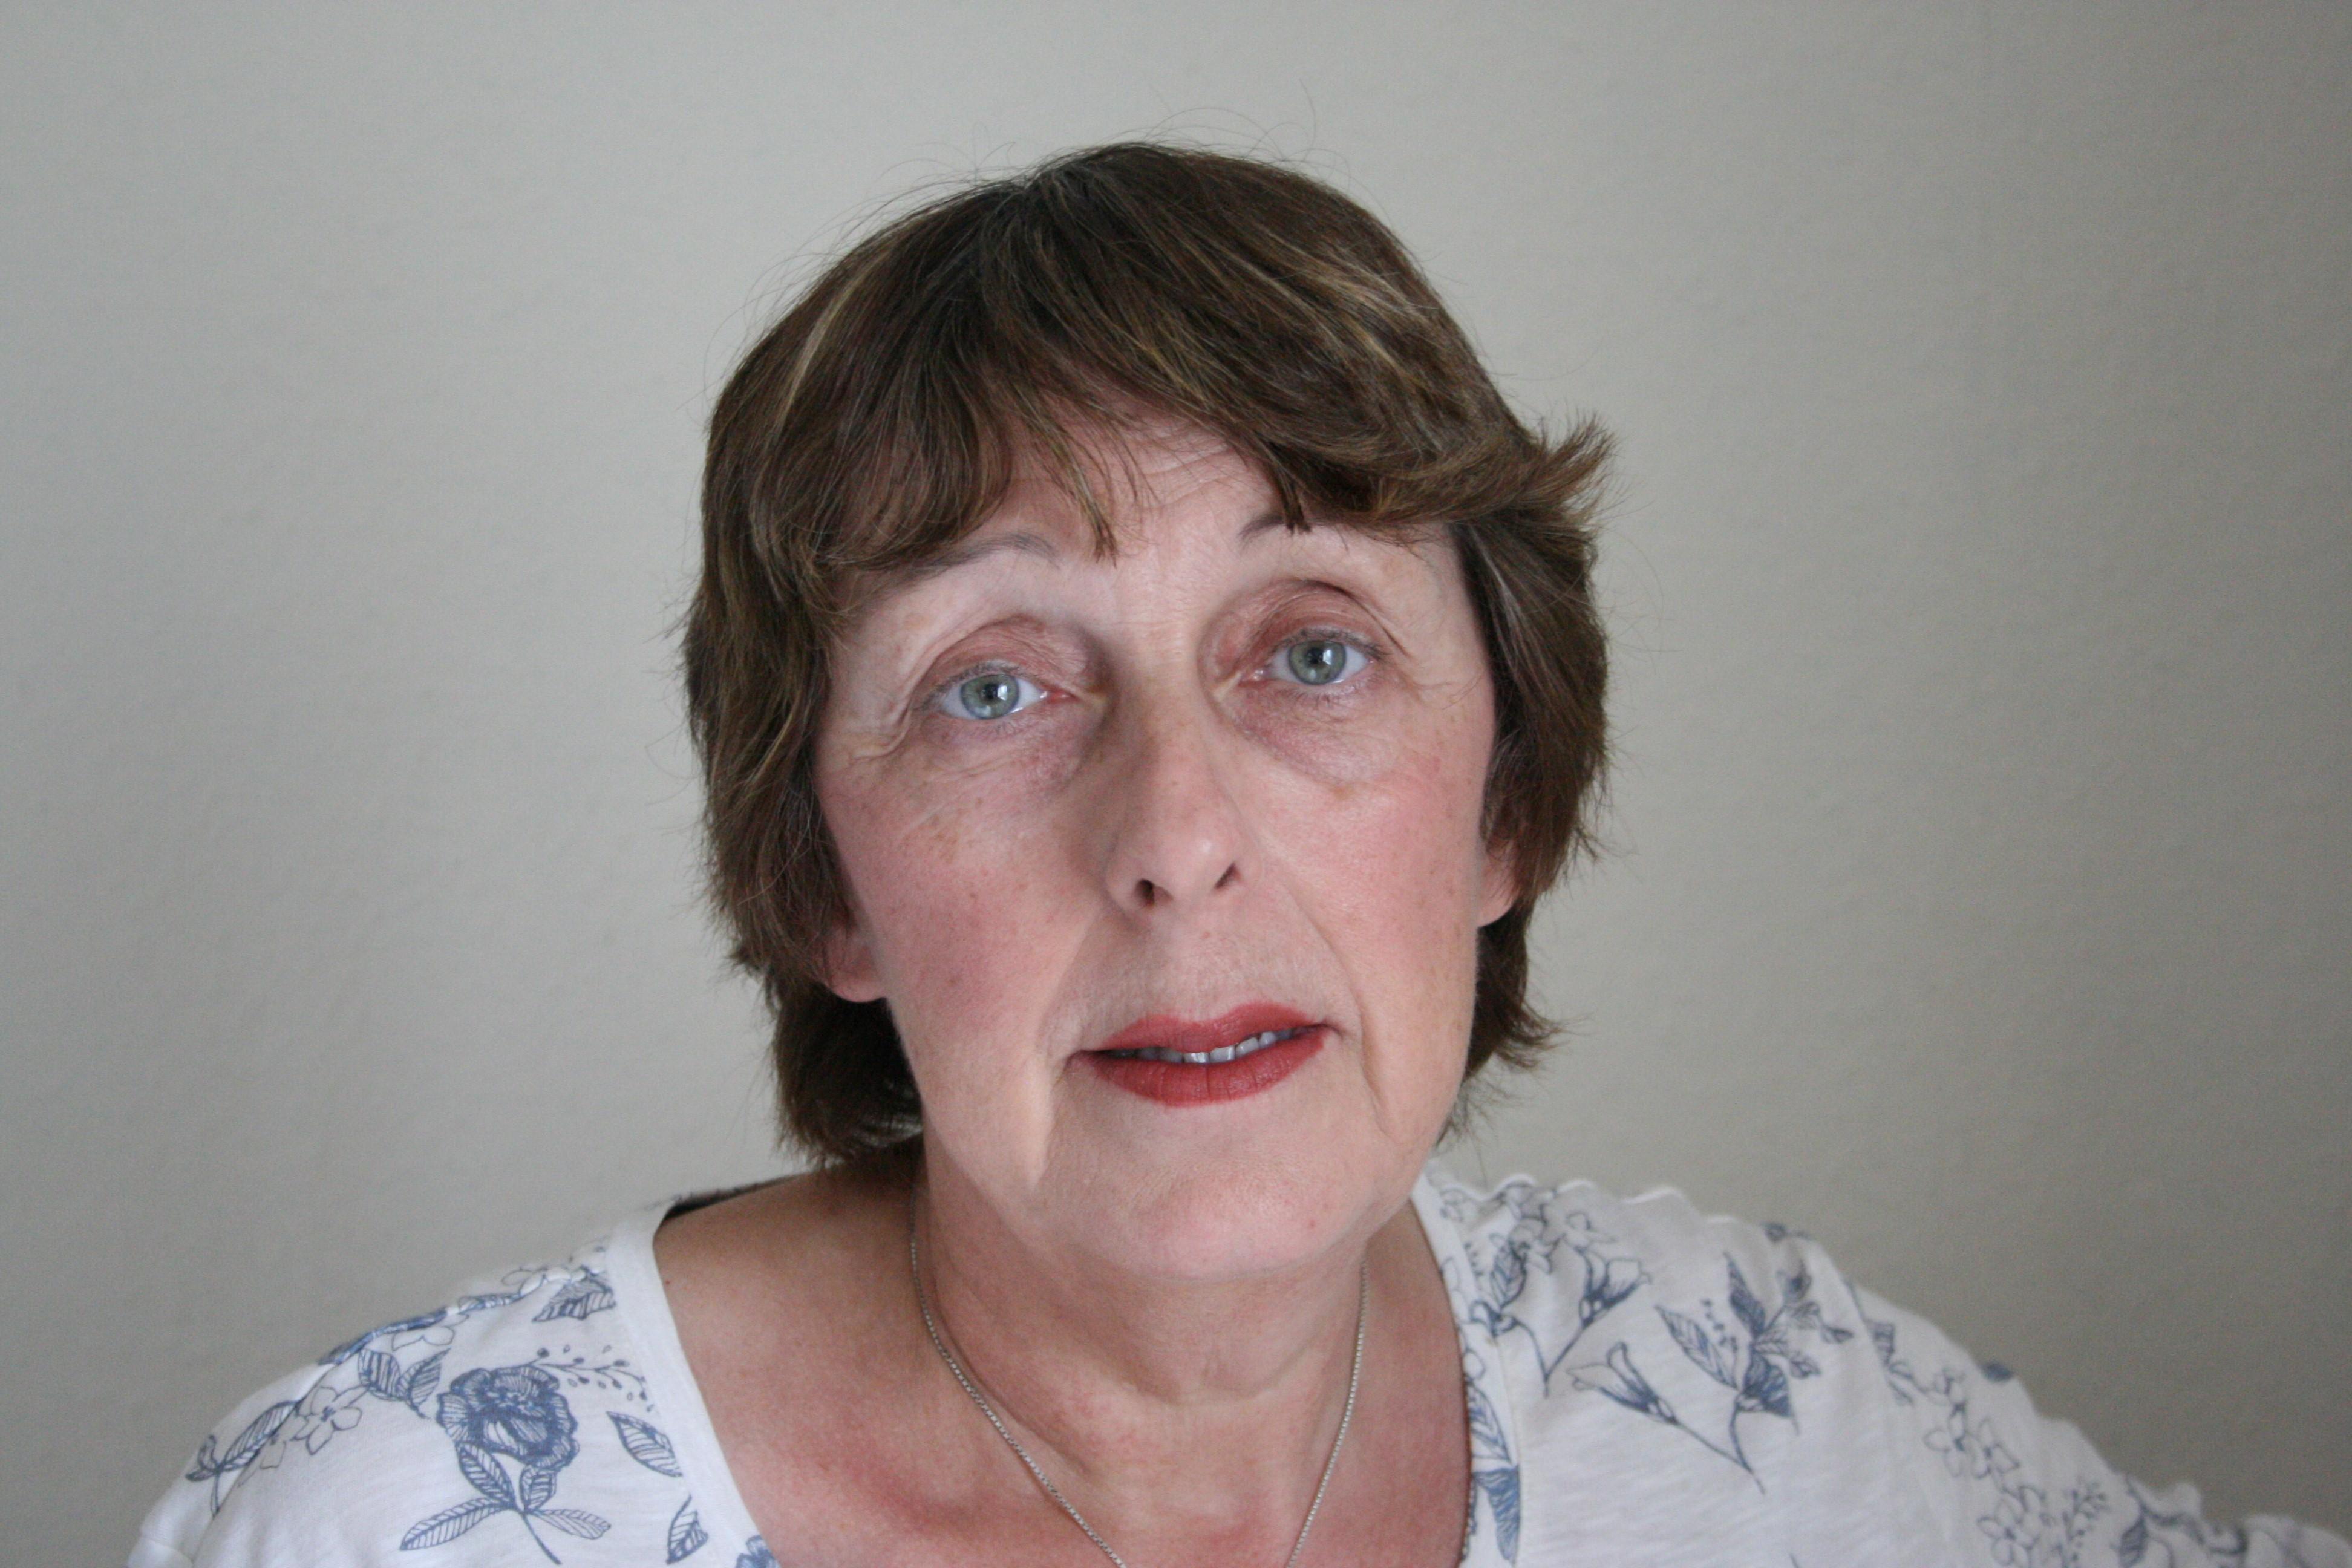 Rosemary Decker-Thomas